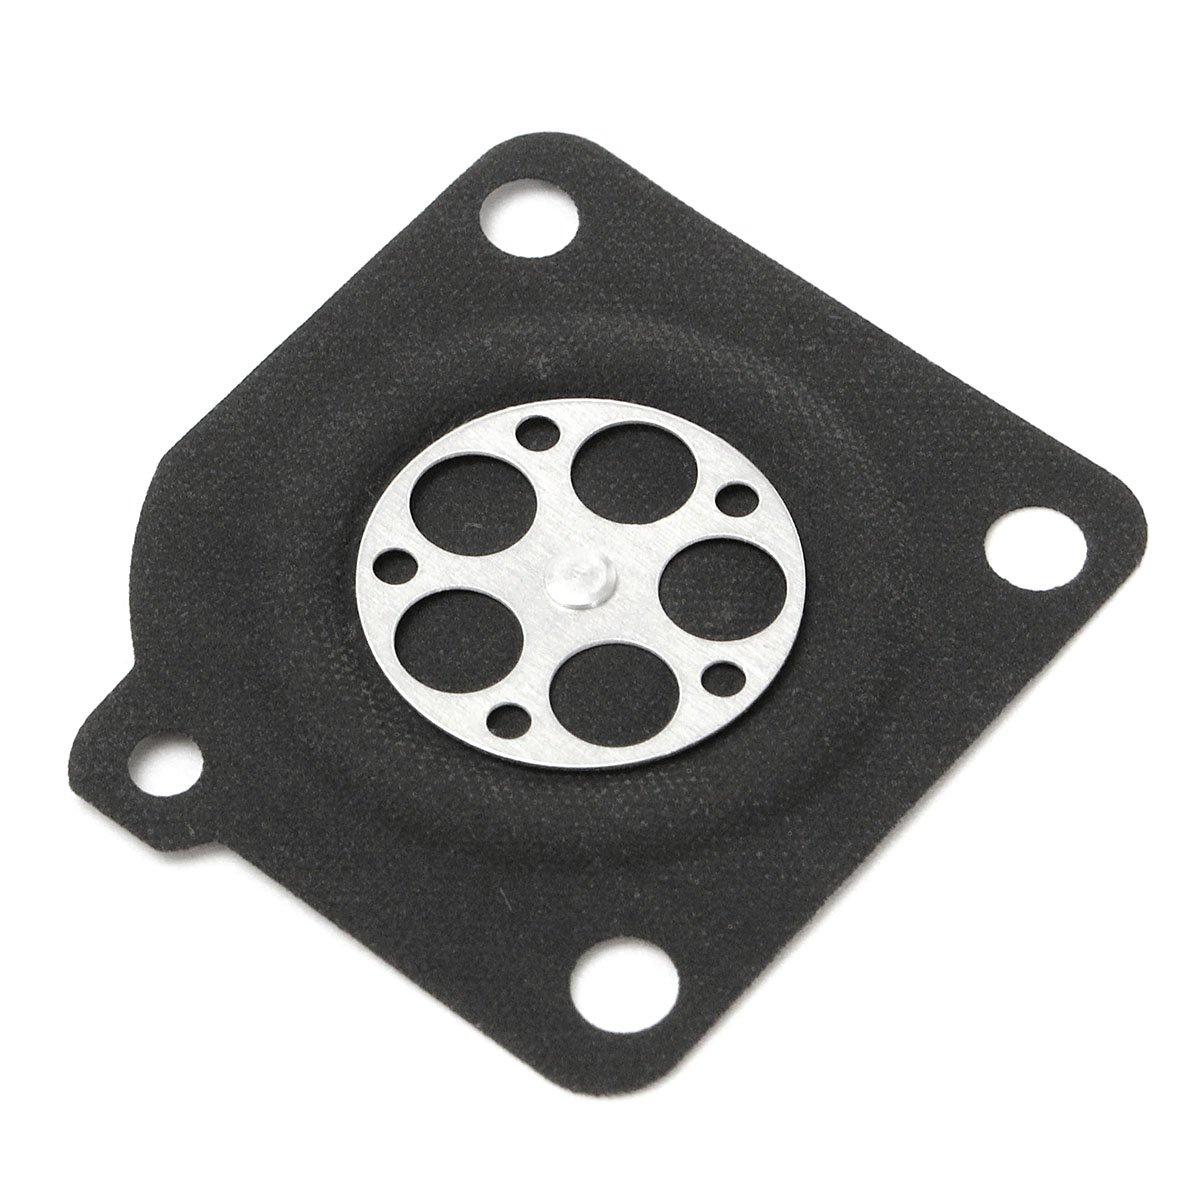 ILS 10 pieces Carburetor Gasket Metering Diaphragm Rebuilt Kit For ZAMA C1U A015010